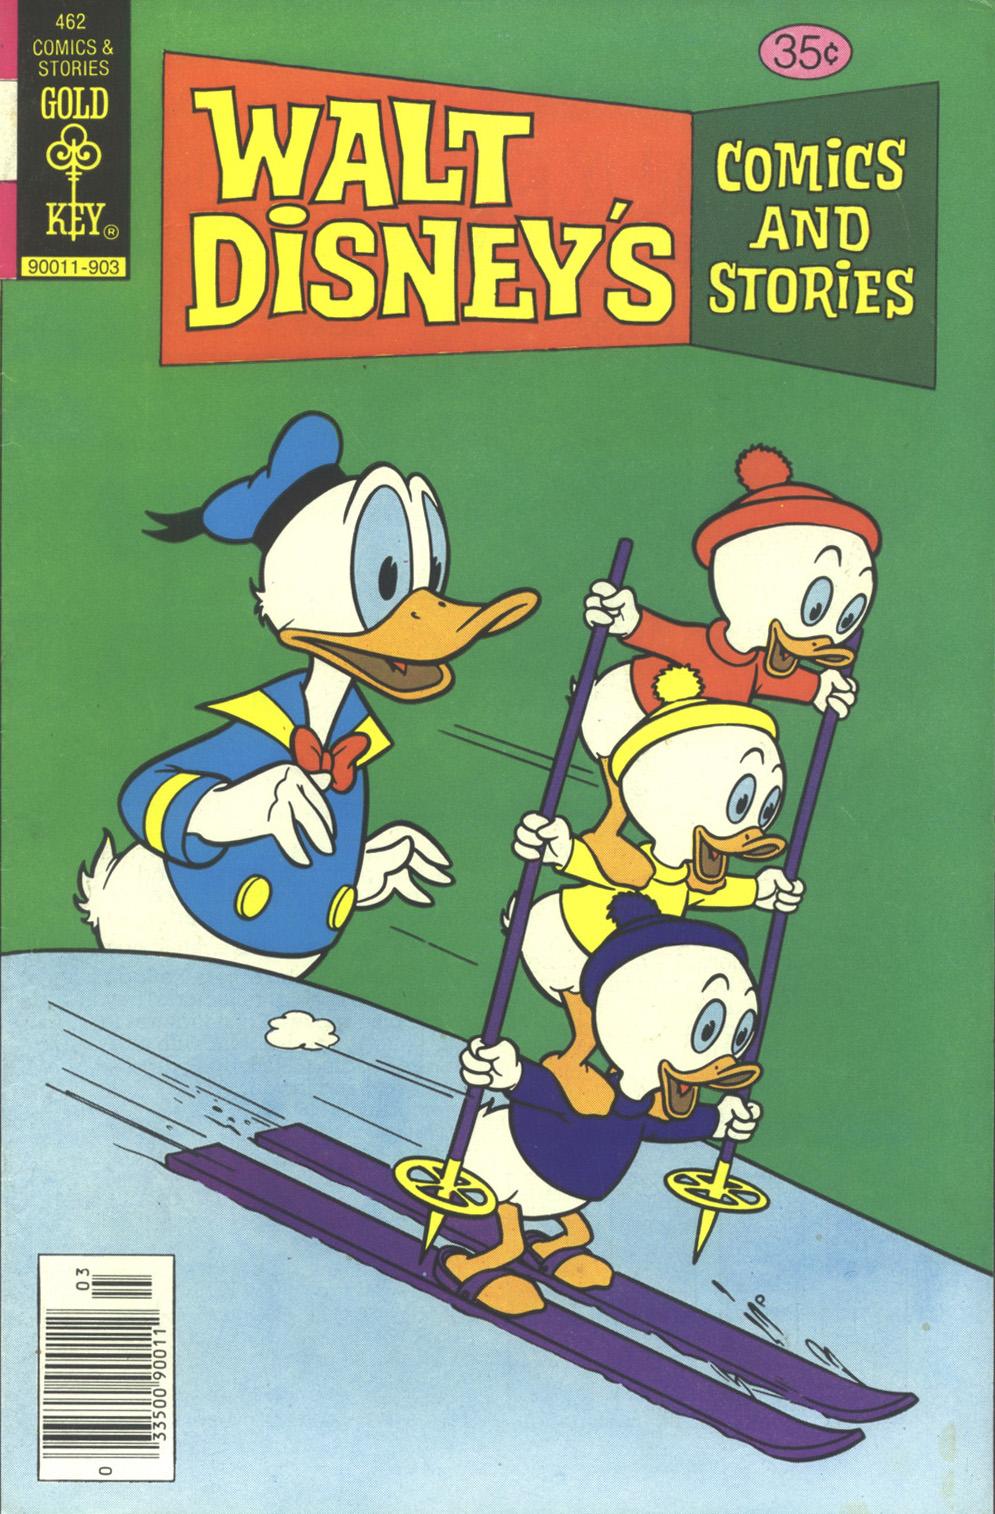 Walt Disneys Comics and Stories 462 Page 1